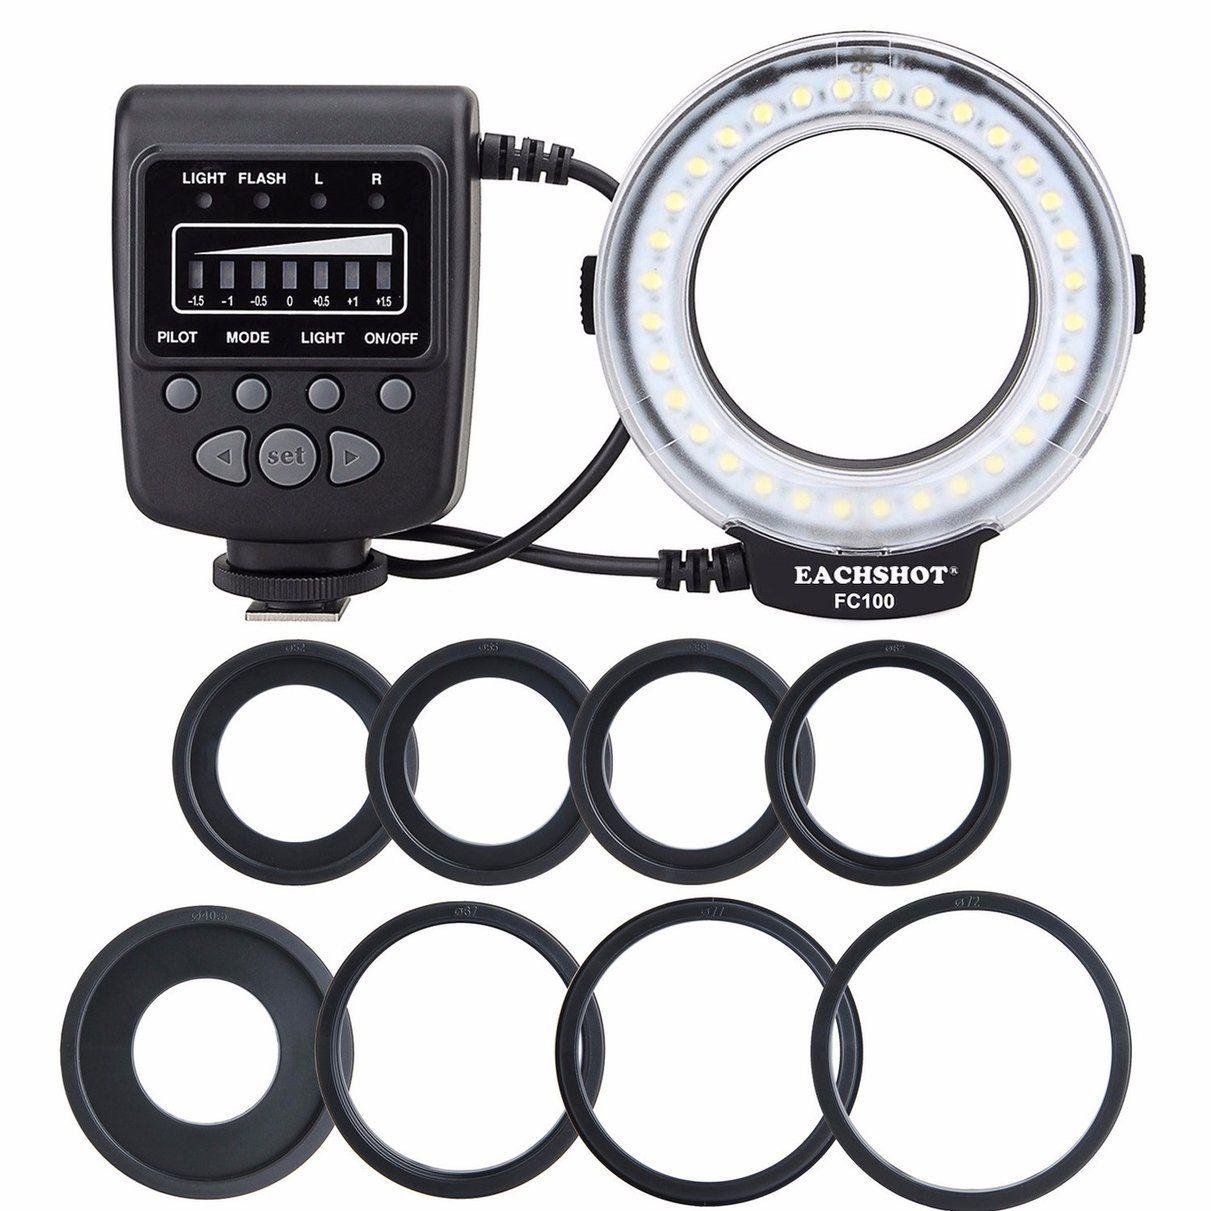 Meike FC-100 for Nikon,Canon FC 100 Macro Ring Flash/Light for Nikon D7100 D7000 D5200 D5100 D5000 D3200 D310